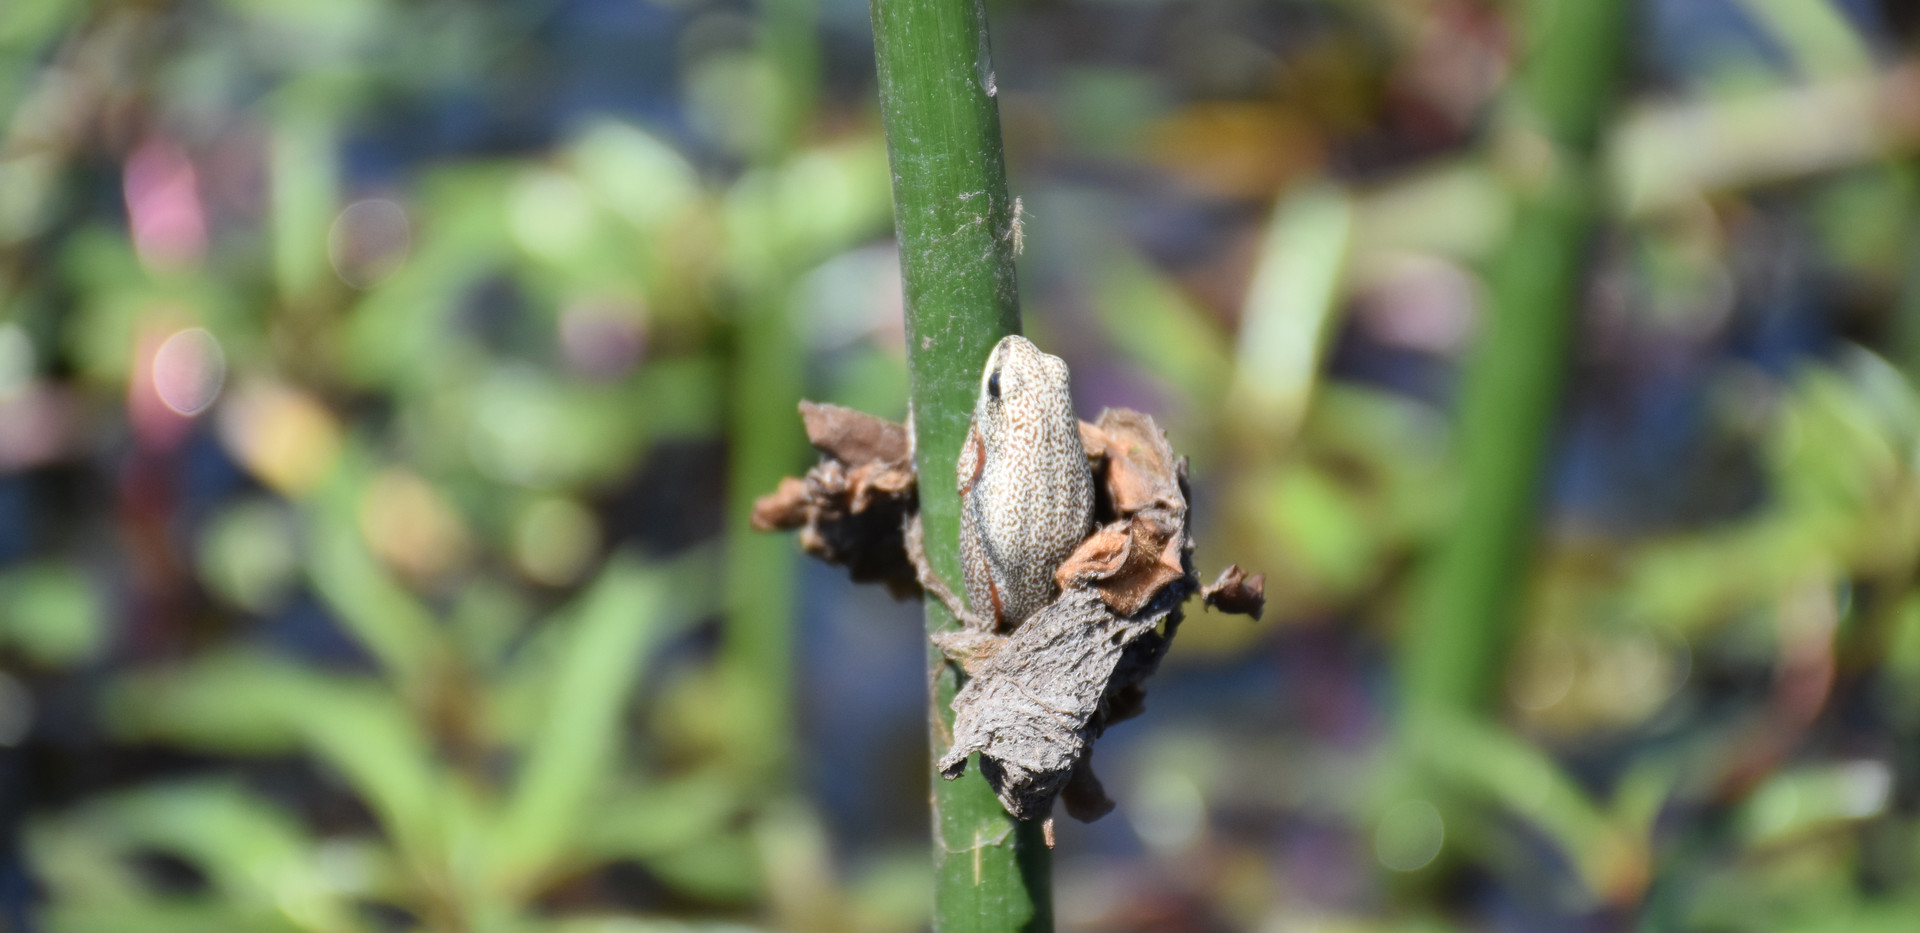 moremi frog.JPG